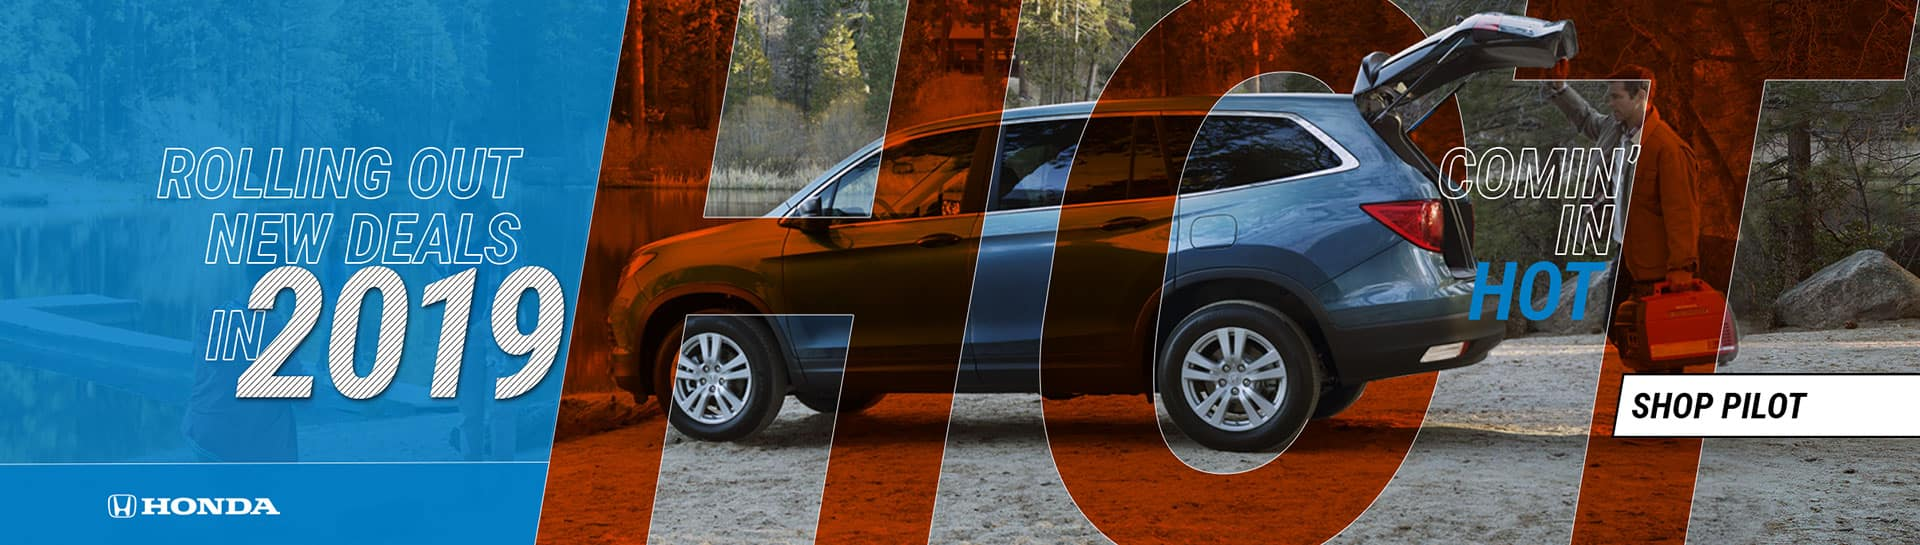 Fort Collins Dealerships >> Markley Motors Honda - The Preferred Dealership In Fort Collins Since 1936